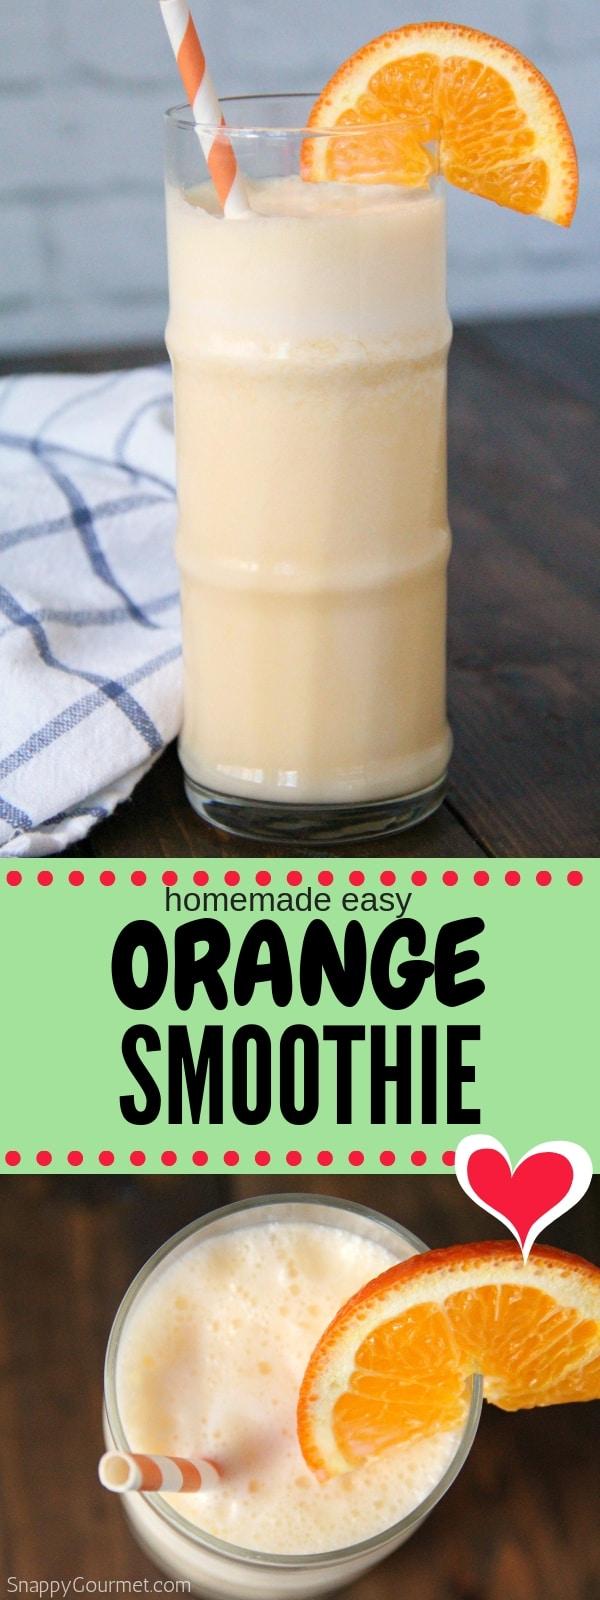 Orange Smoothie photo collage